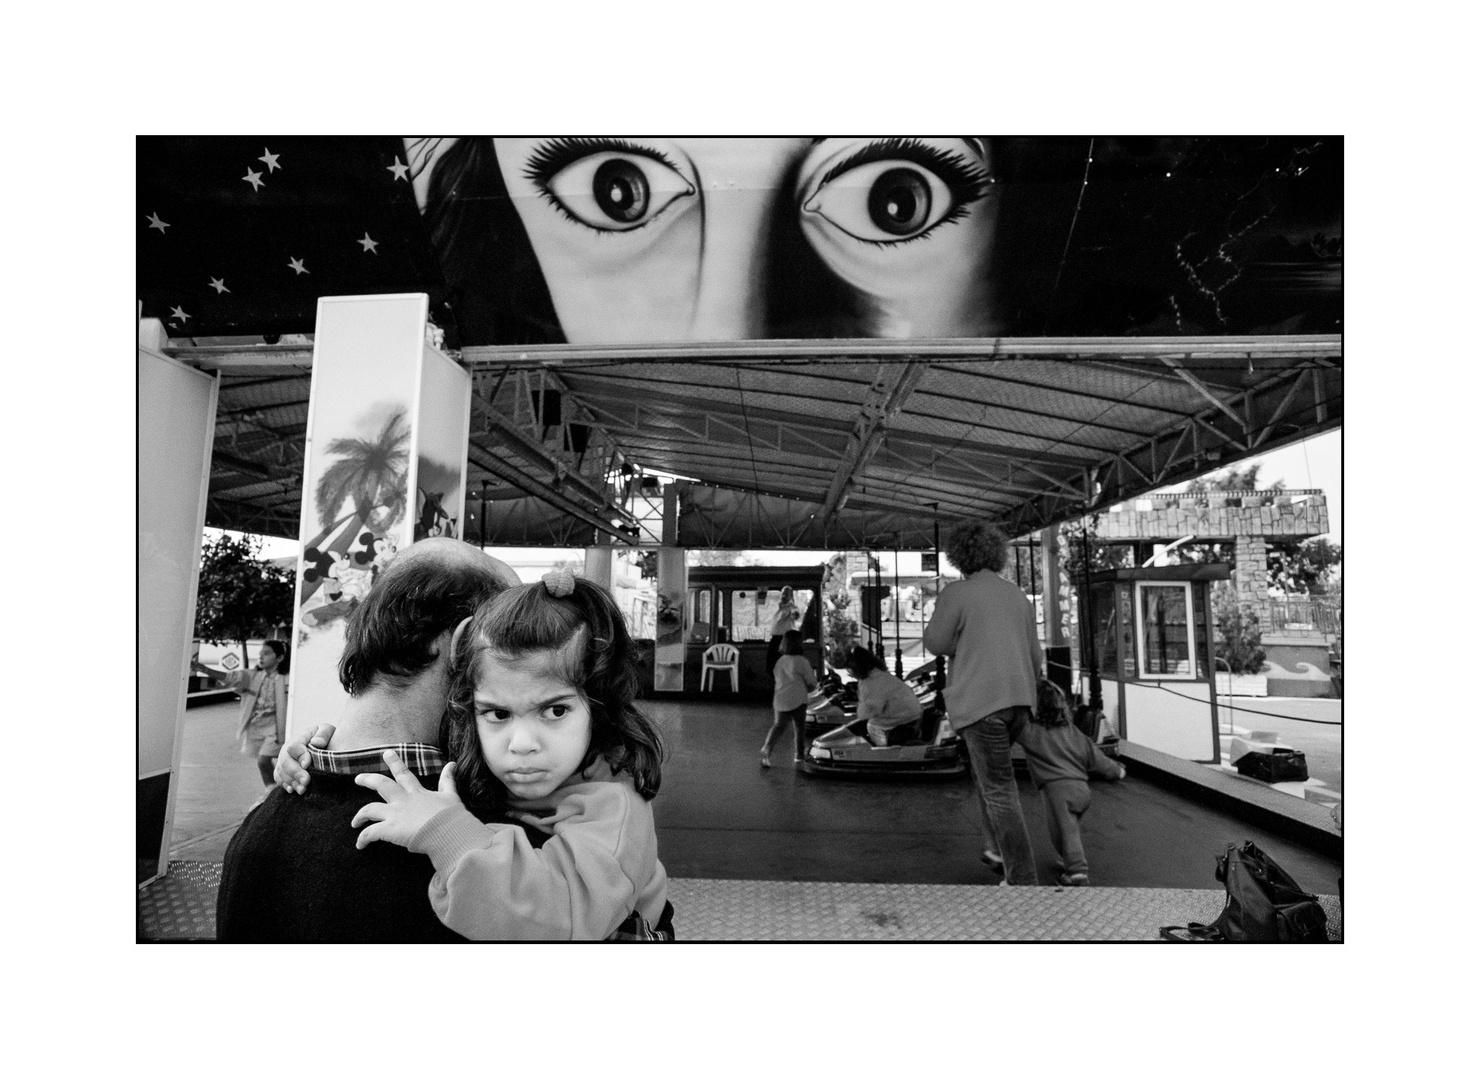 intense glance photo & image   people images at photo ...